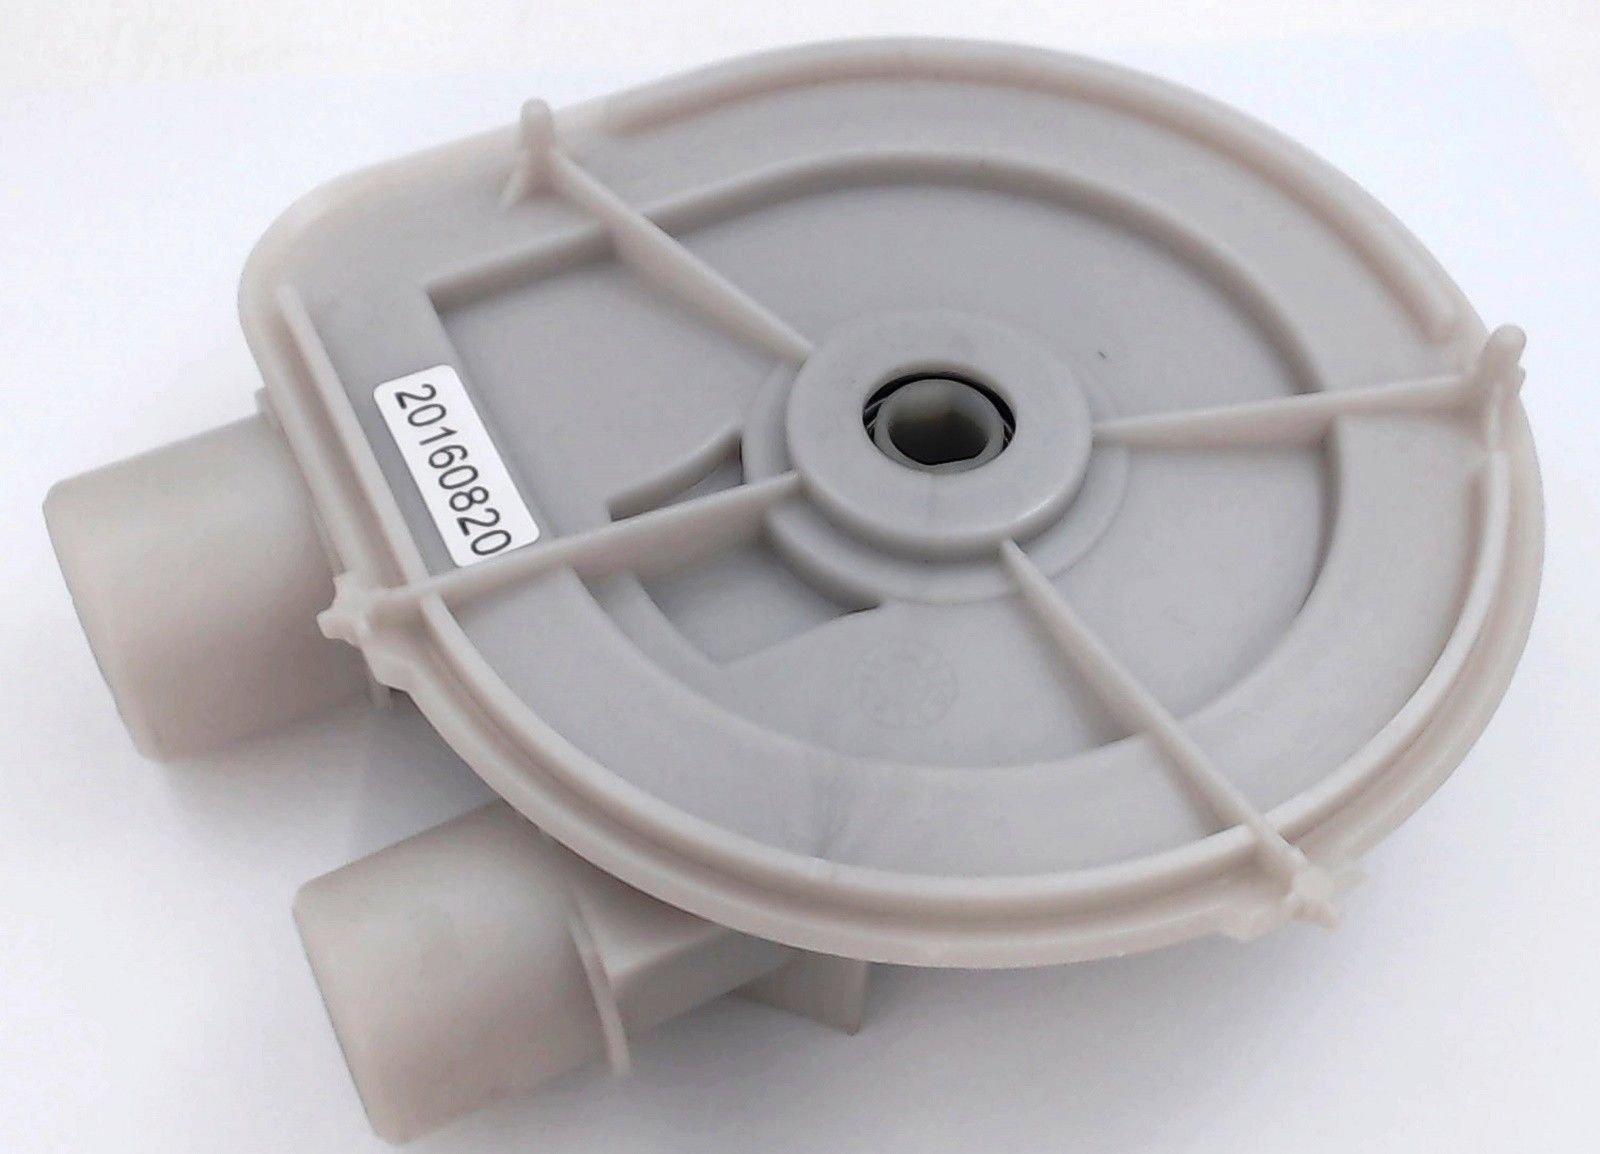 Pokin 131208500 - Direct Drive Pump for Frigidaire Washer AP2106307, 3204452, 5303272432, 763, AH417159, EA417159, LP119, PS417159.